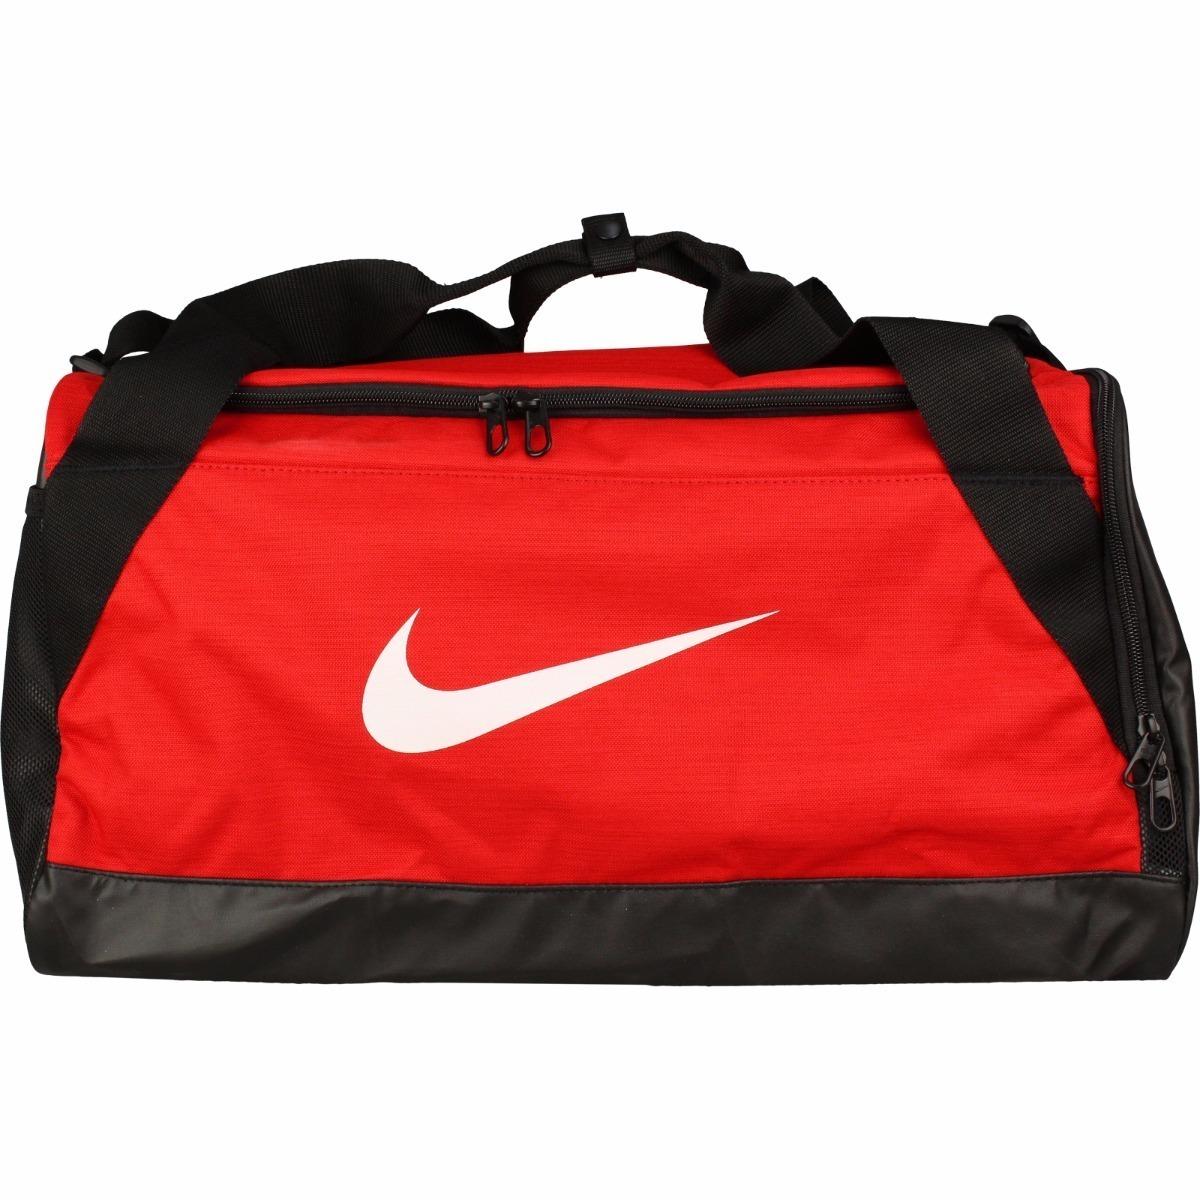 3dfc0abf maleta deportiva nike brasilia rojo/negro grande con envío. Cargando zoom.